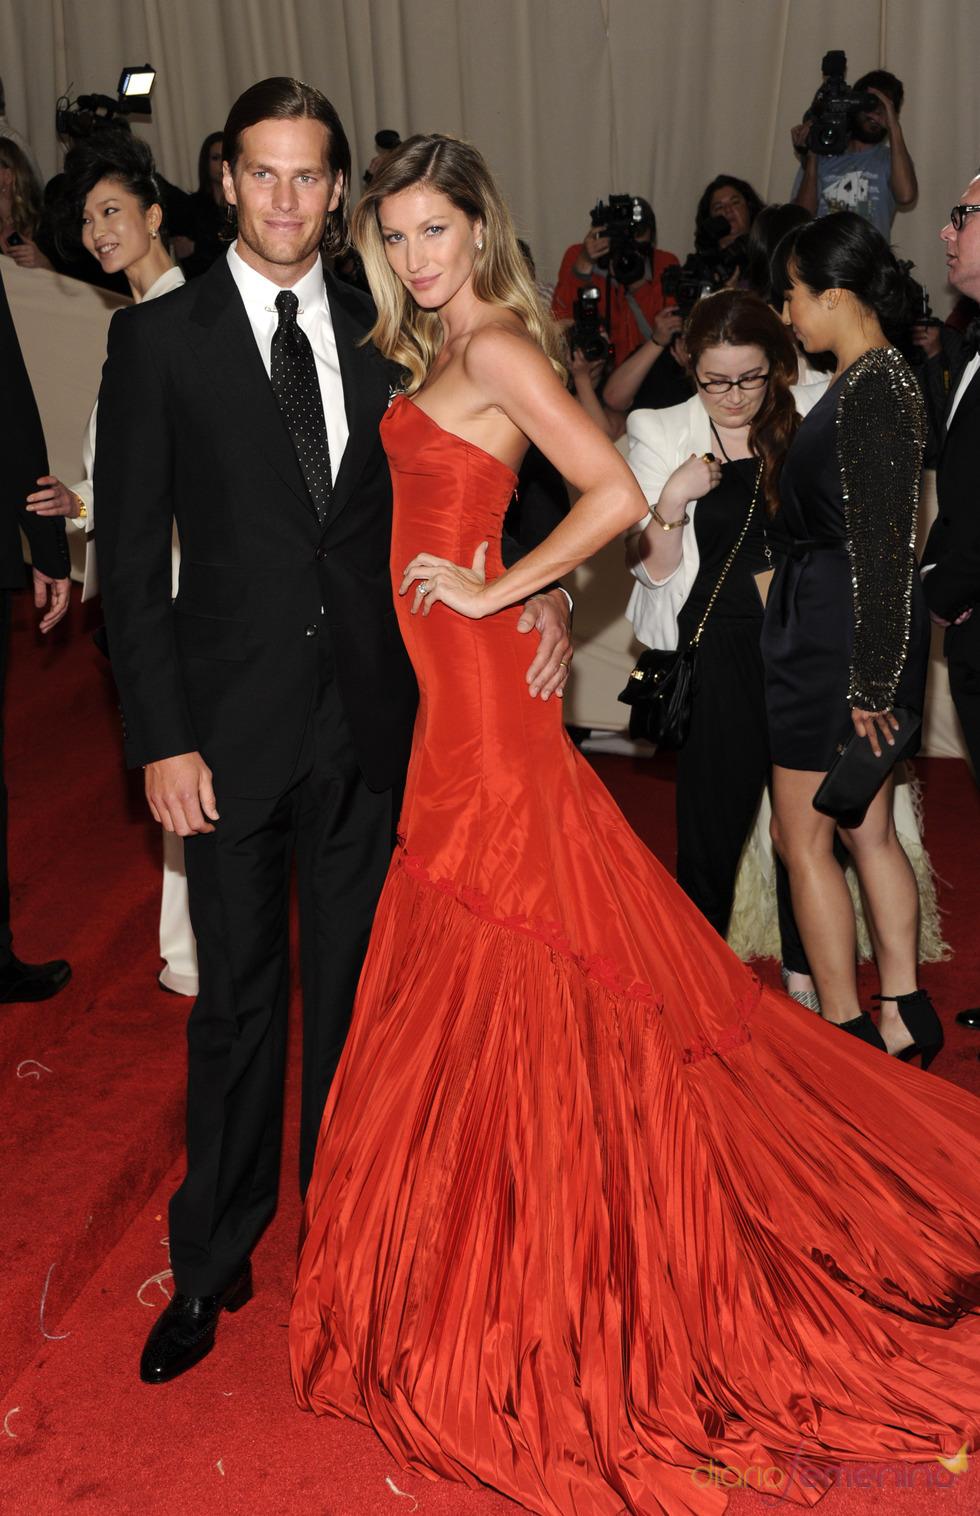 Tom Brady y Gisele Bündchen en la gala Costume en el Museo Metropolitano de Arte